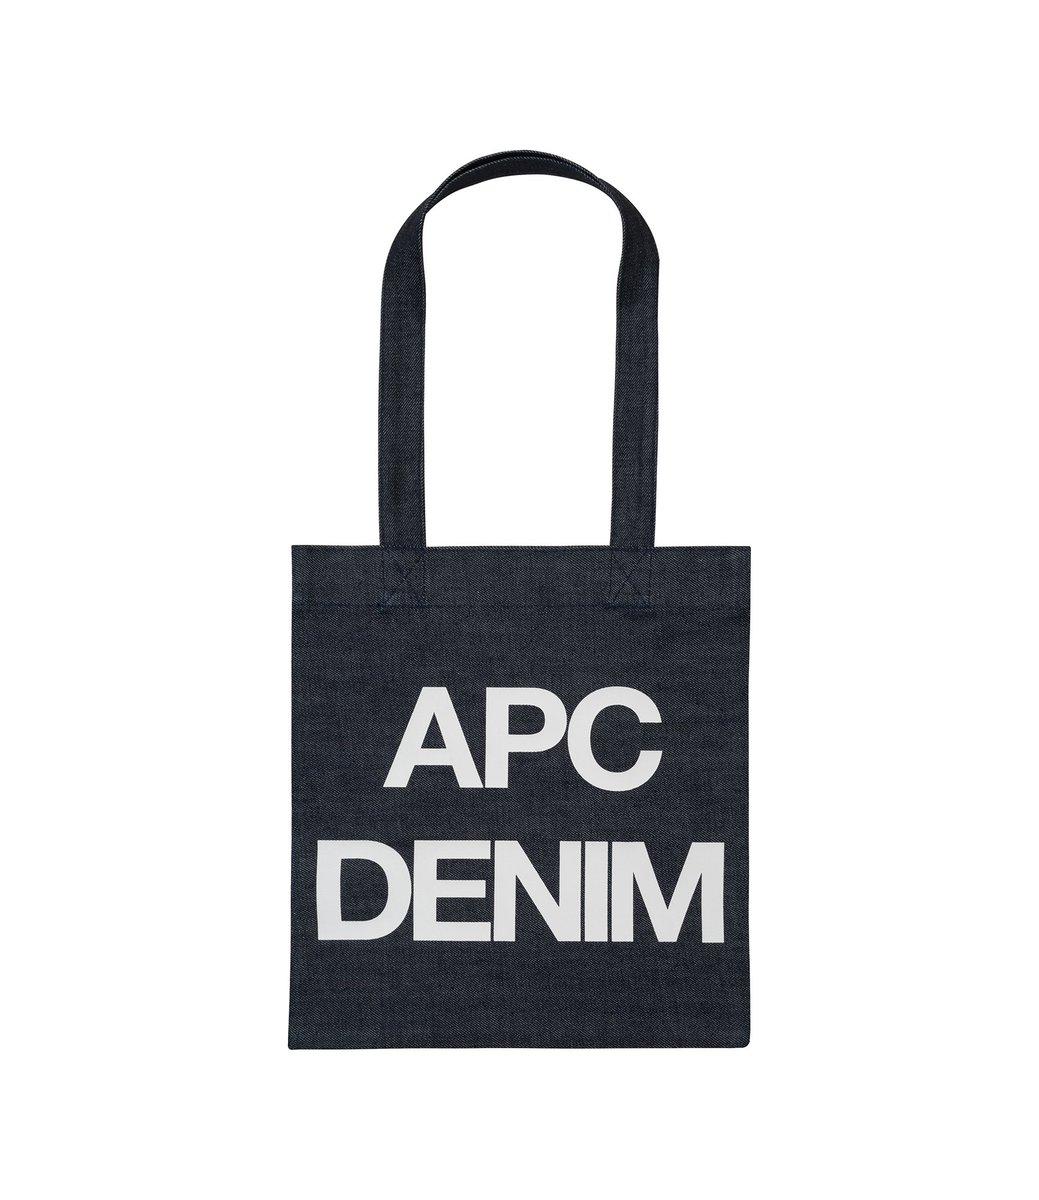 #APC 2018年 春夏コレクション A.P.C. Denim バッグ https://t.co/mIDo35eo8j https://t.co/k8LSCo6R5t